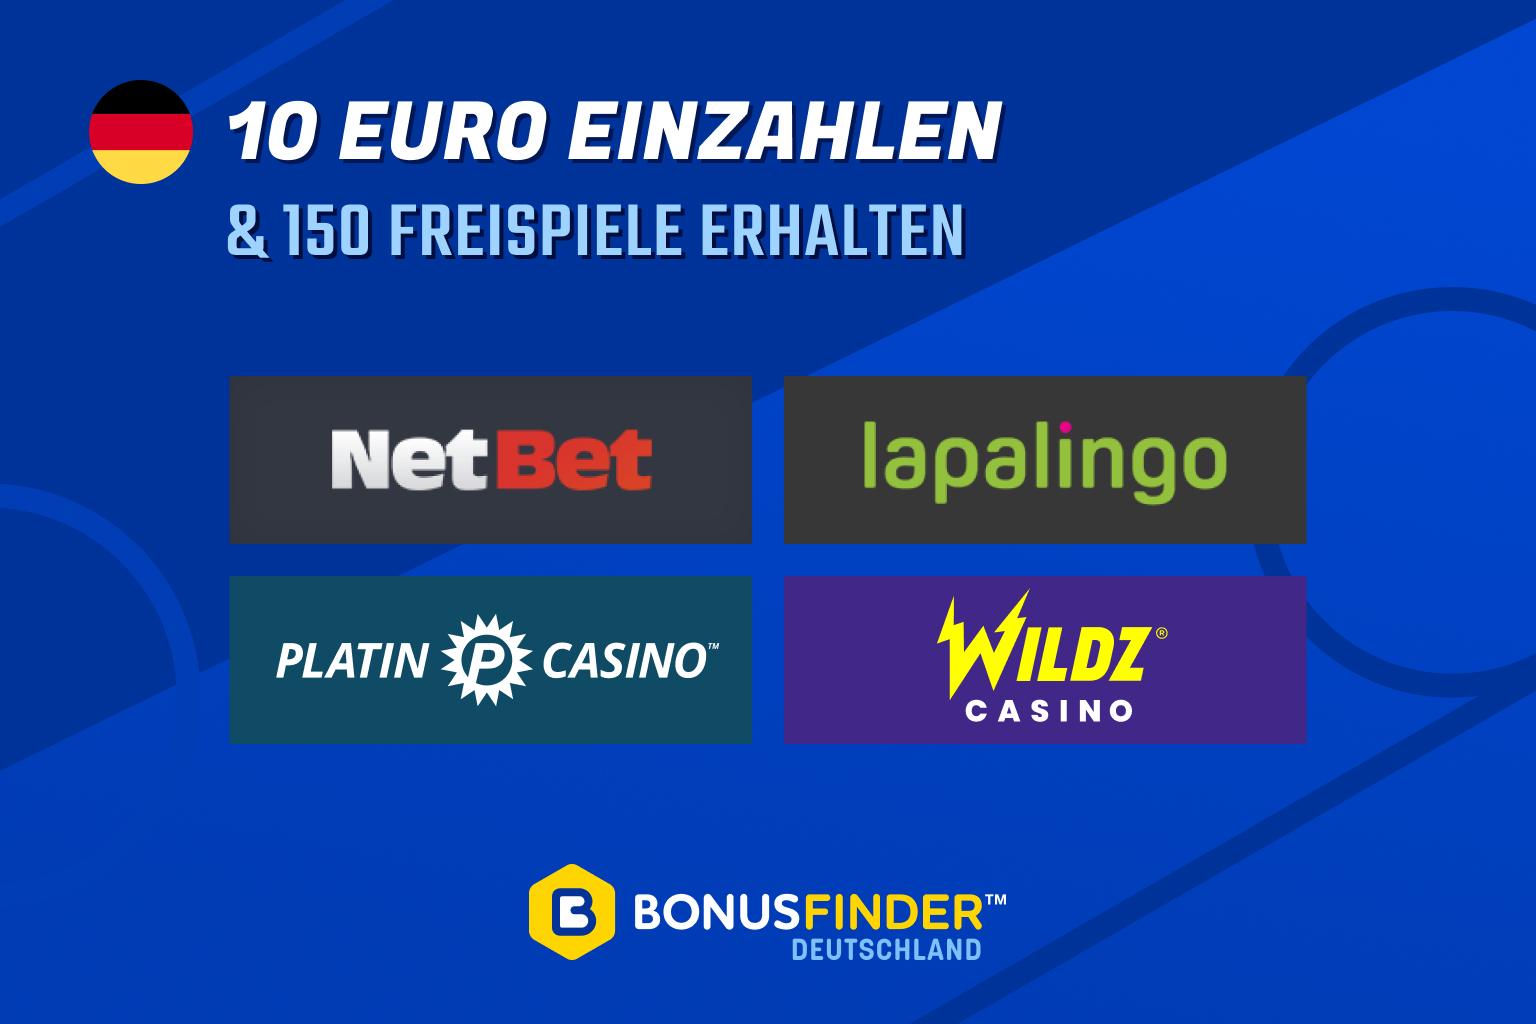 10 euro einzahlen 150 freispiele